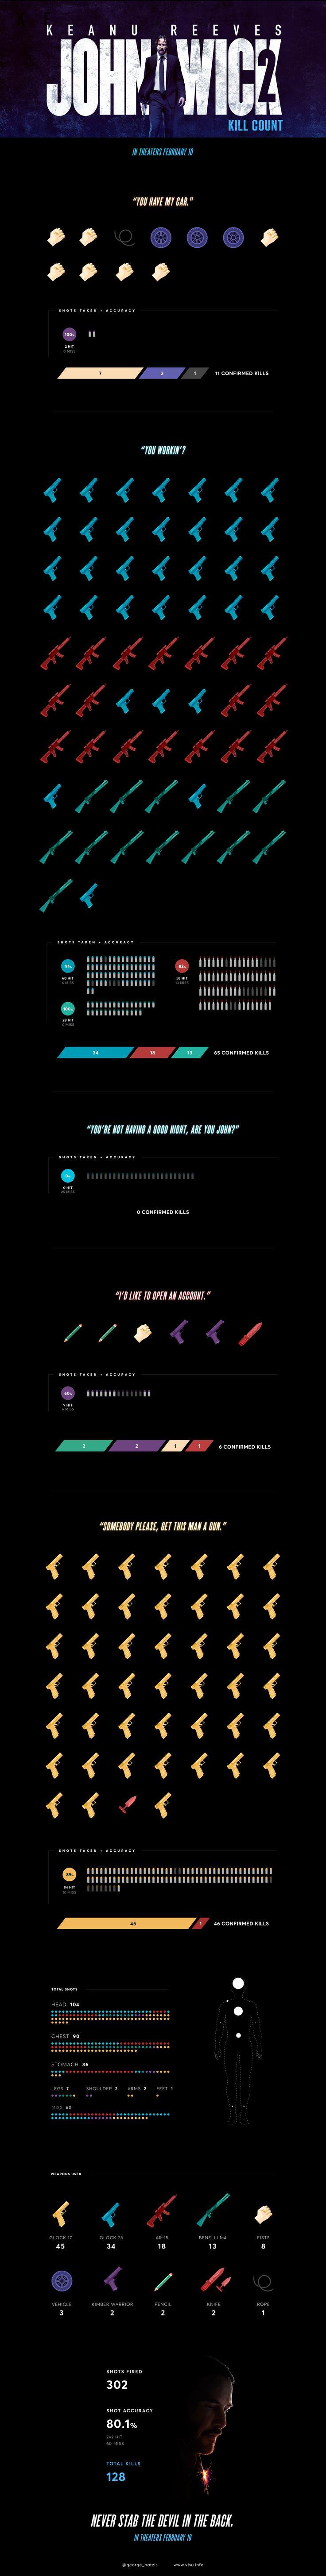 John Wick: Kill Count - Visu #infographic